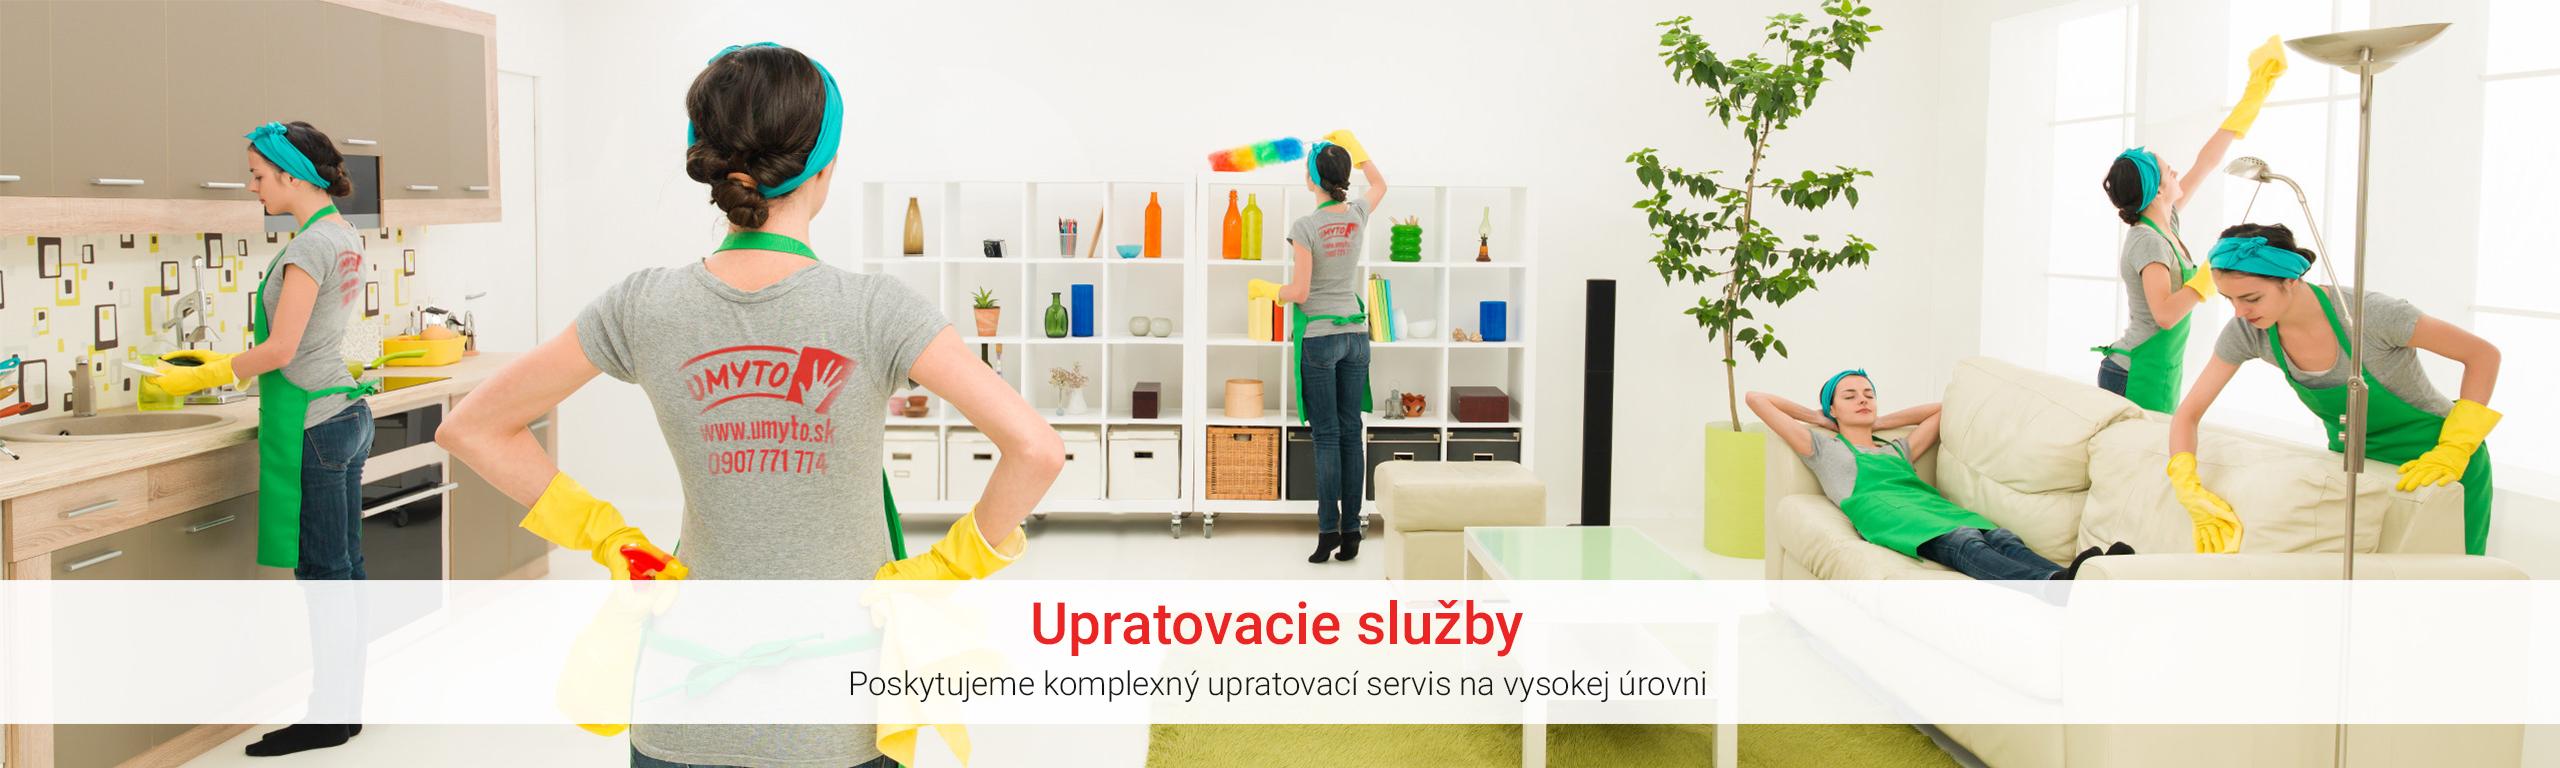 Upratovacie služby